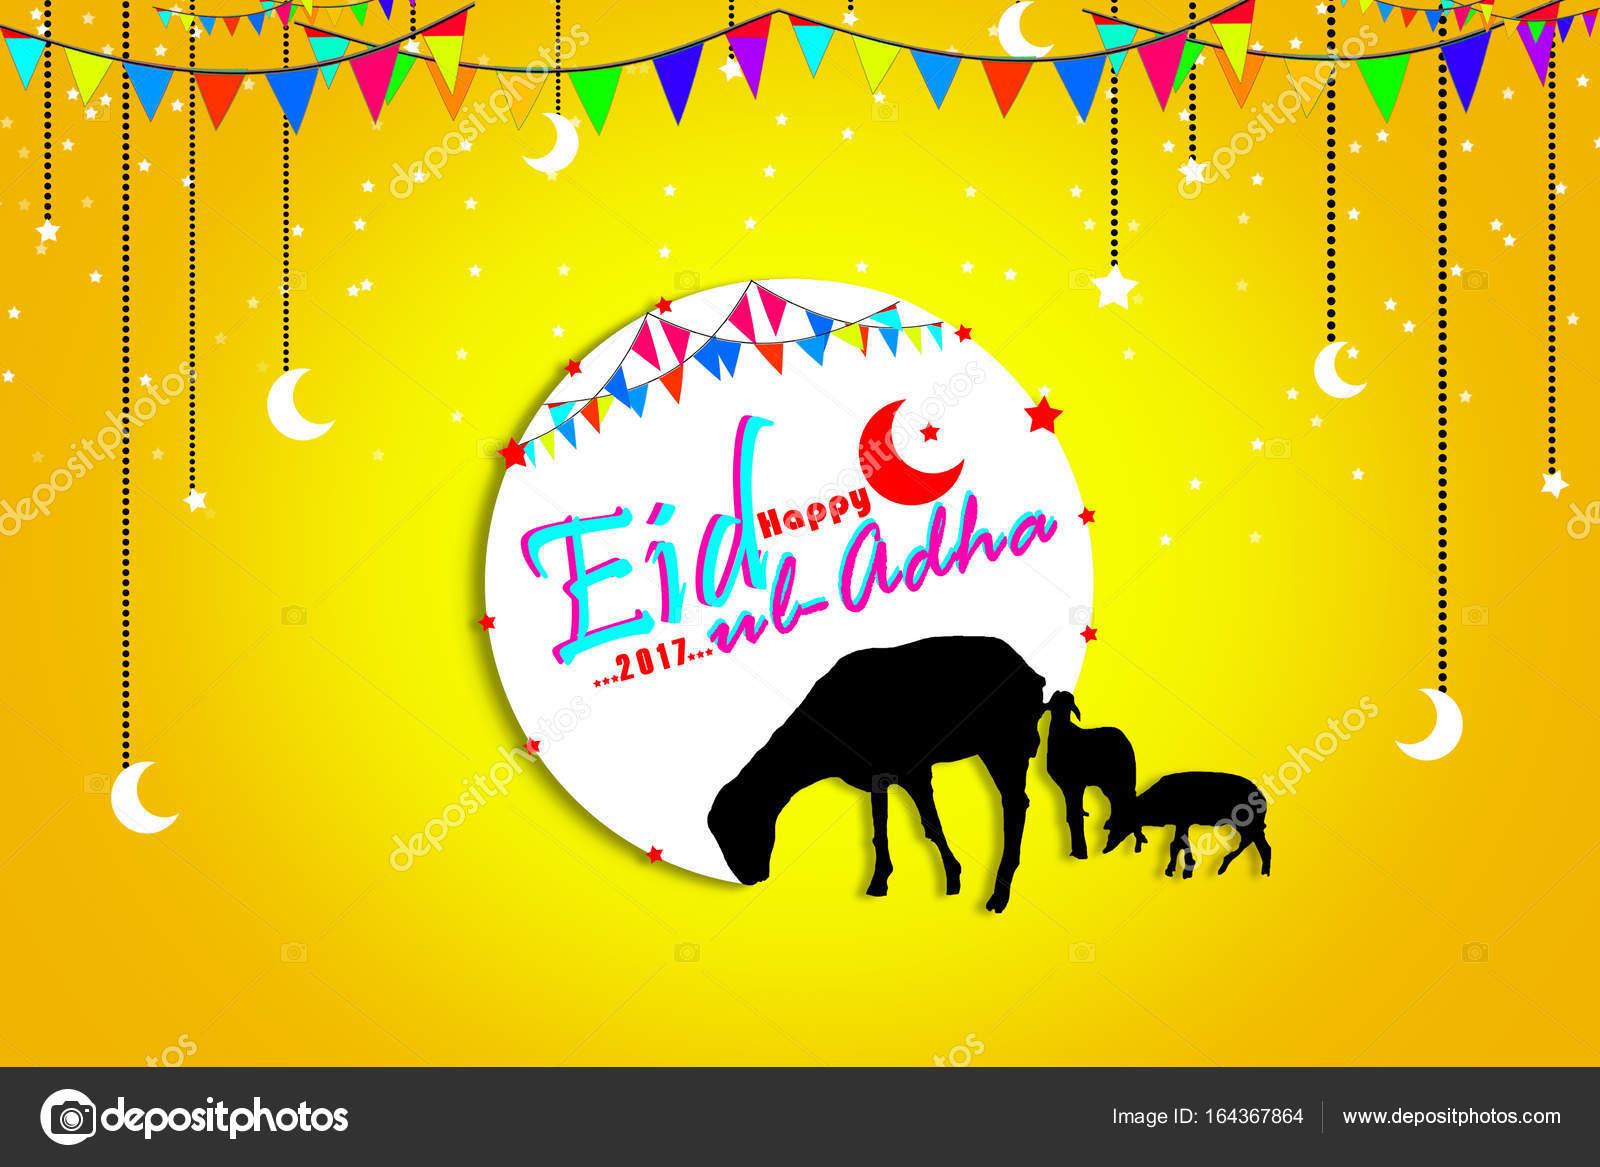 Muslim Community Festival Eid Ul Adha Mubarak Celebrations Greeting